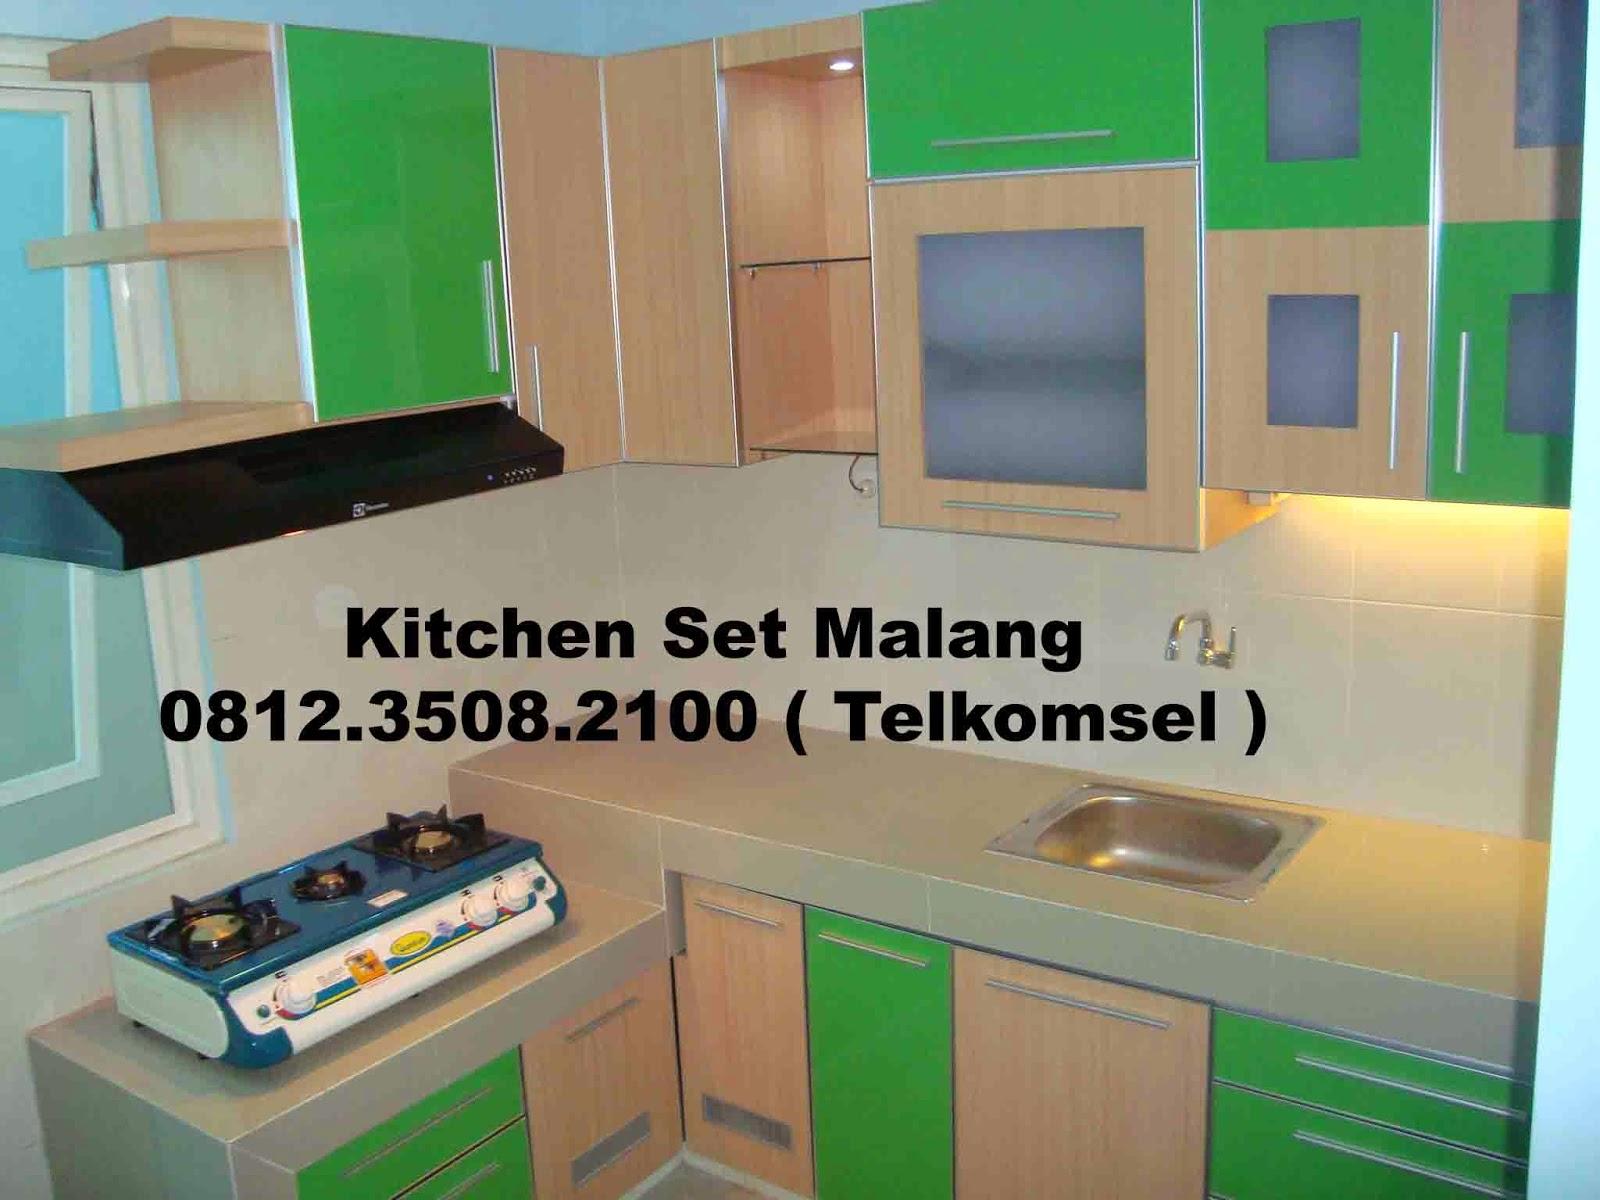 Toko kitchen images for Toko kitchen set